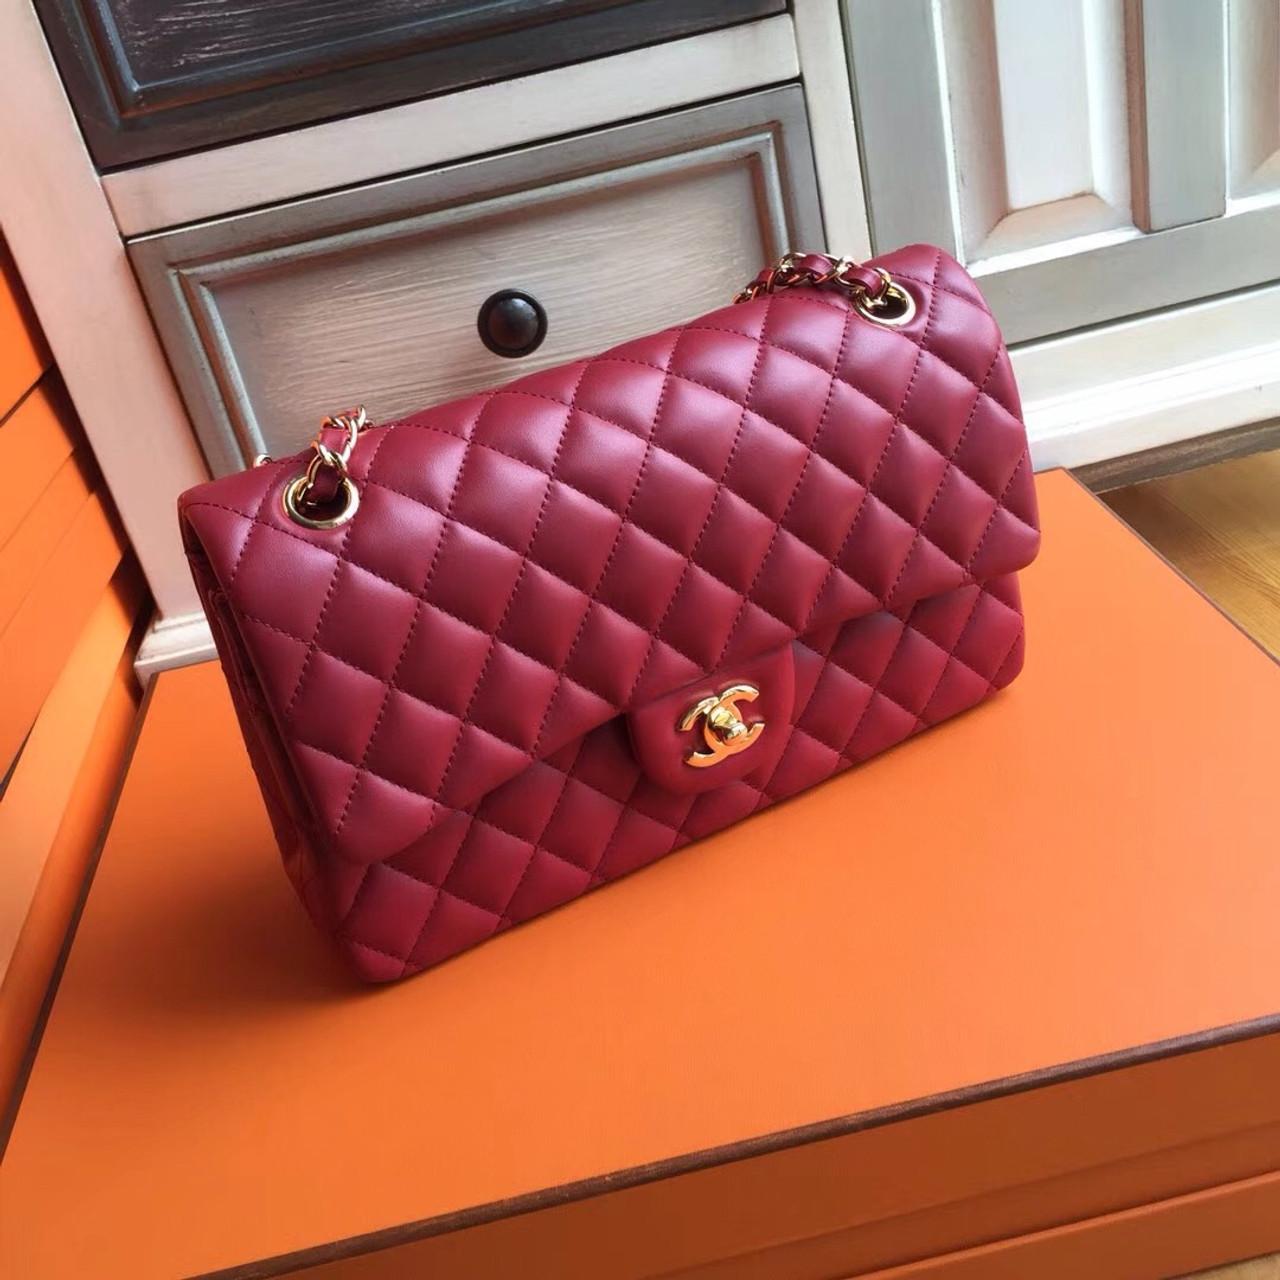 4c886eaec348 Chanel Red Lambskin Classic Flap Bag - Bella Vita Moda